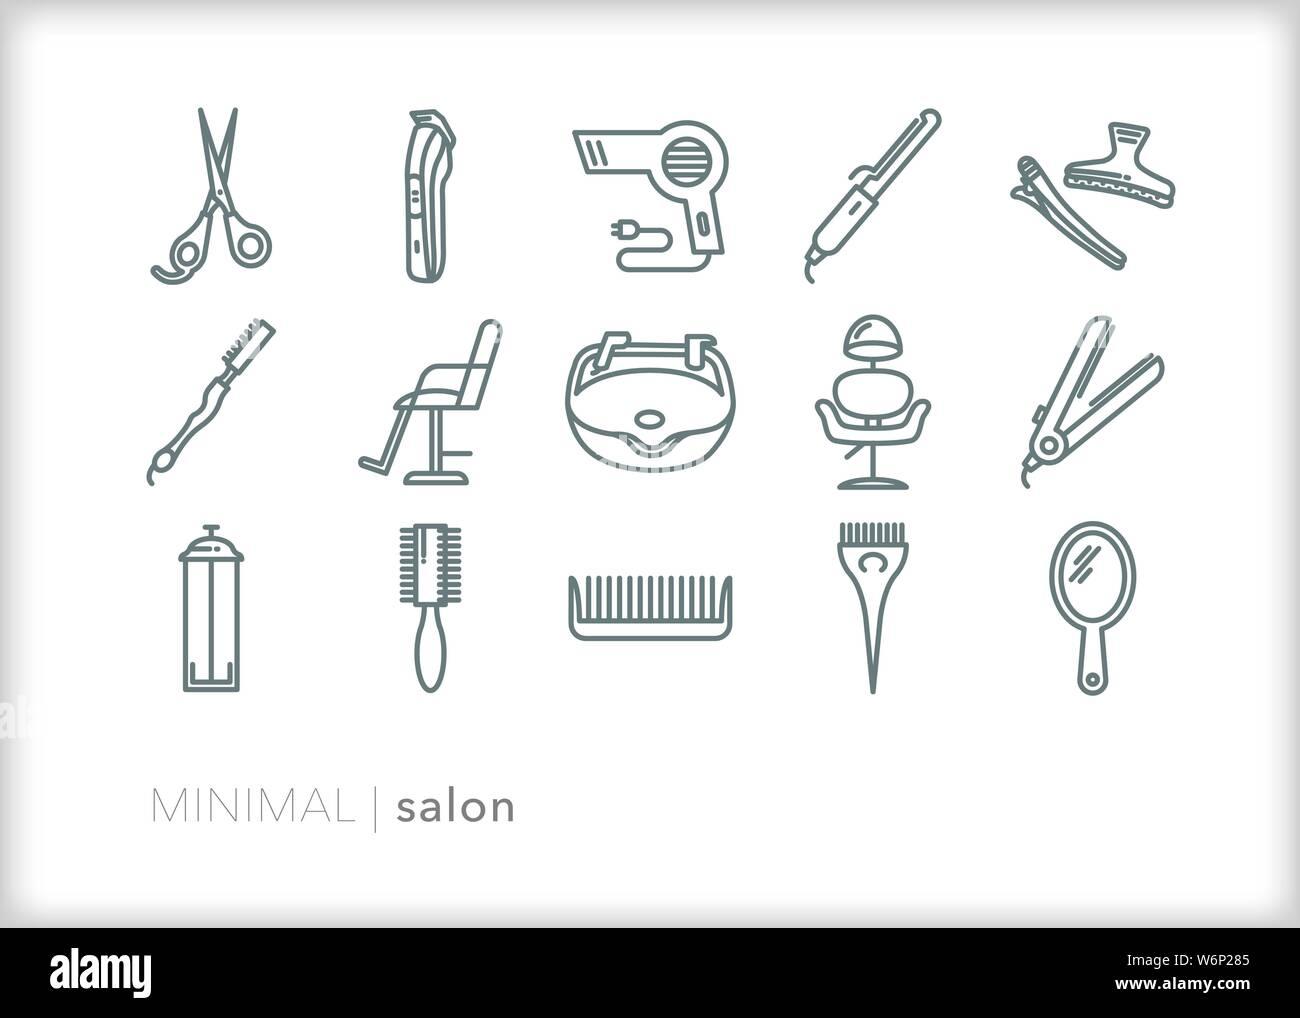 Hair Cutting Scissors Icon Flat Stockfotos & Hair Cutting ... on